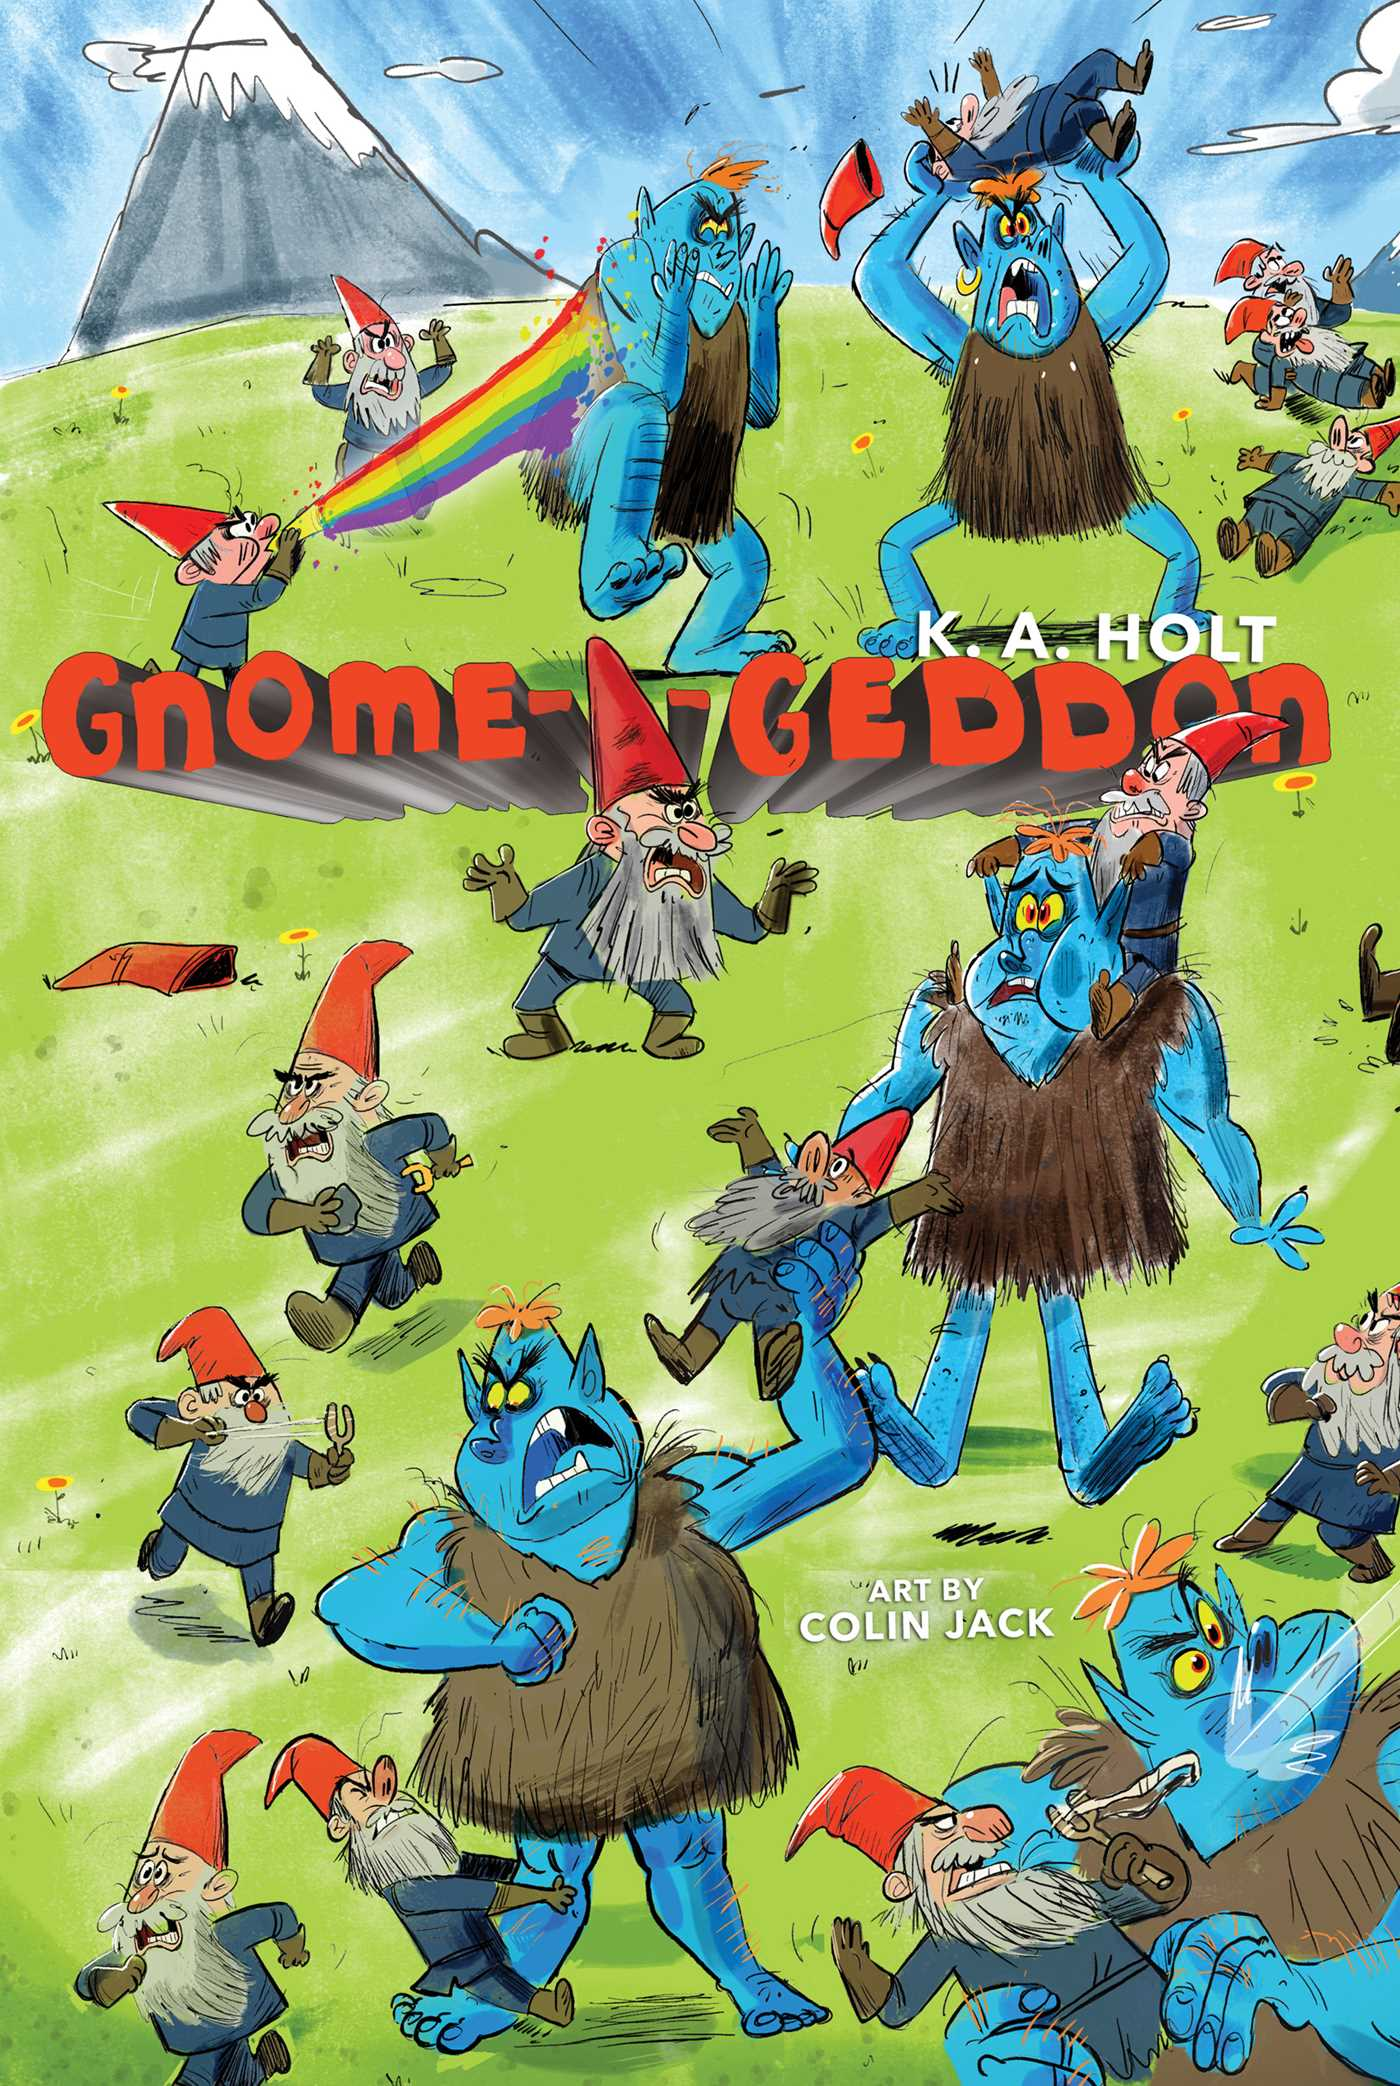 Gnome a geddon 9781481478458 hr